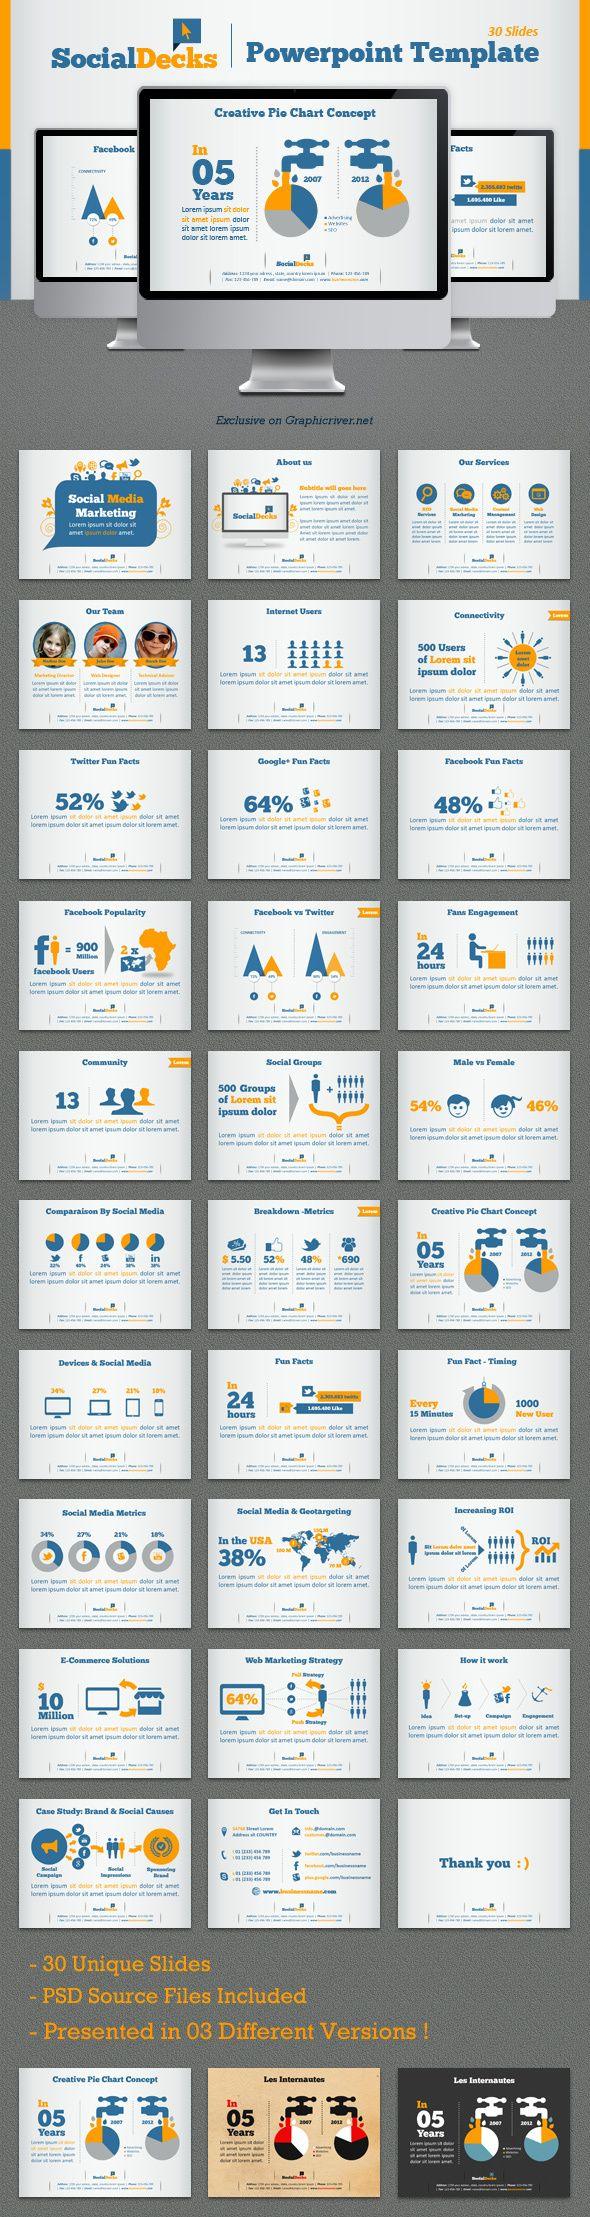 SocialDecks Powerpoint Template by kh2838 Studio, via Behance